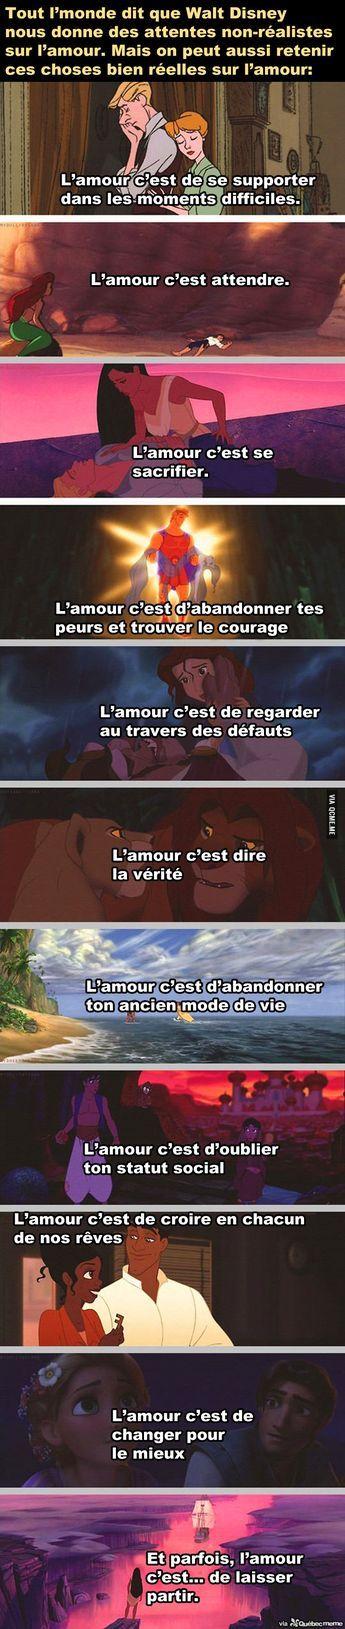 Disney, une passerelle vers la sagesse.